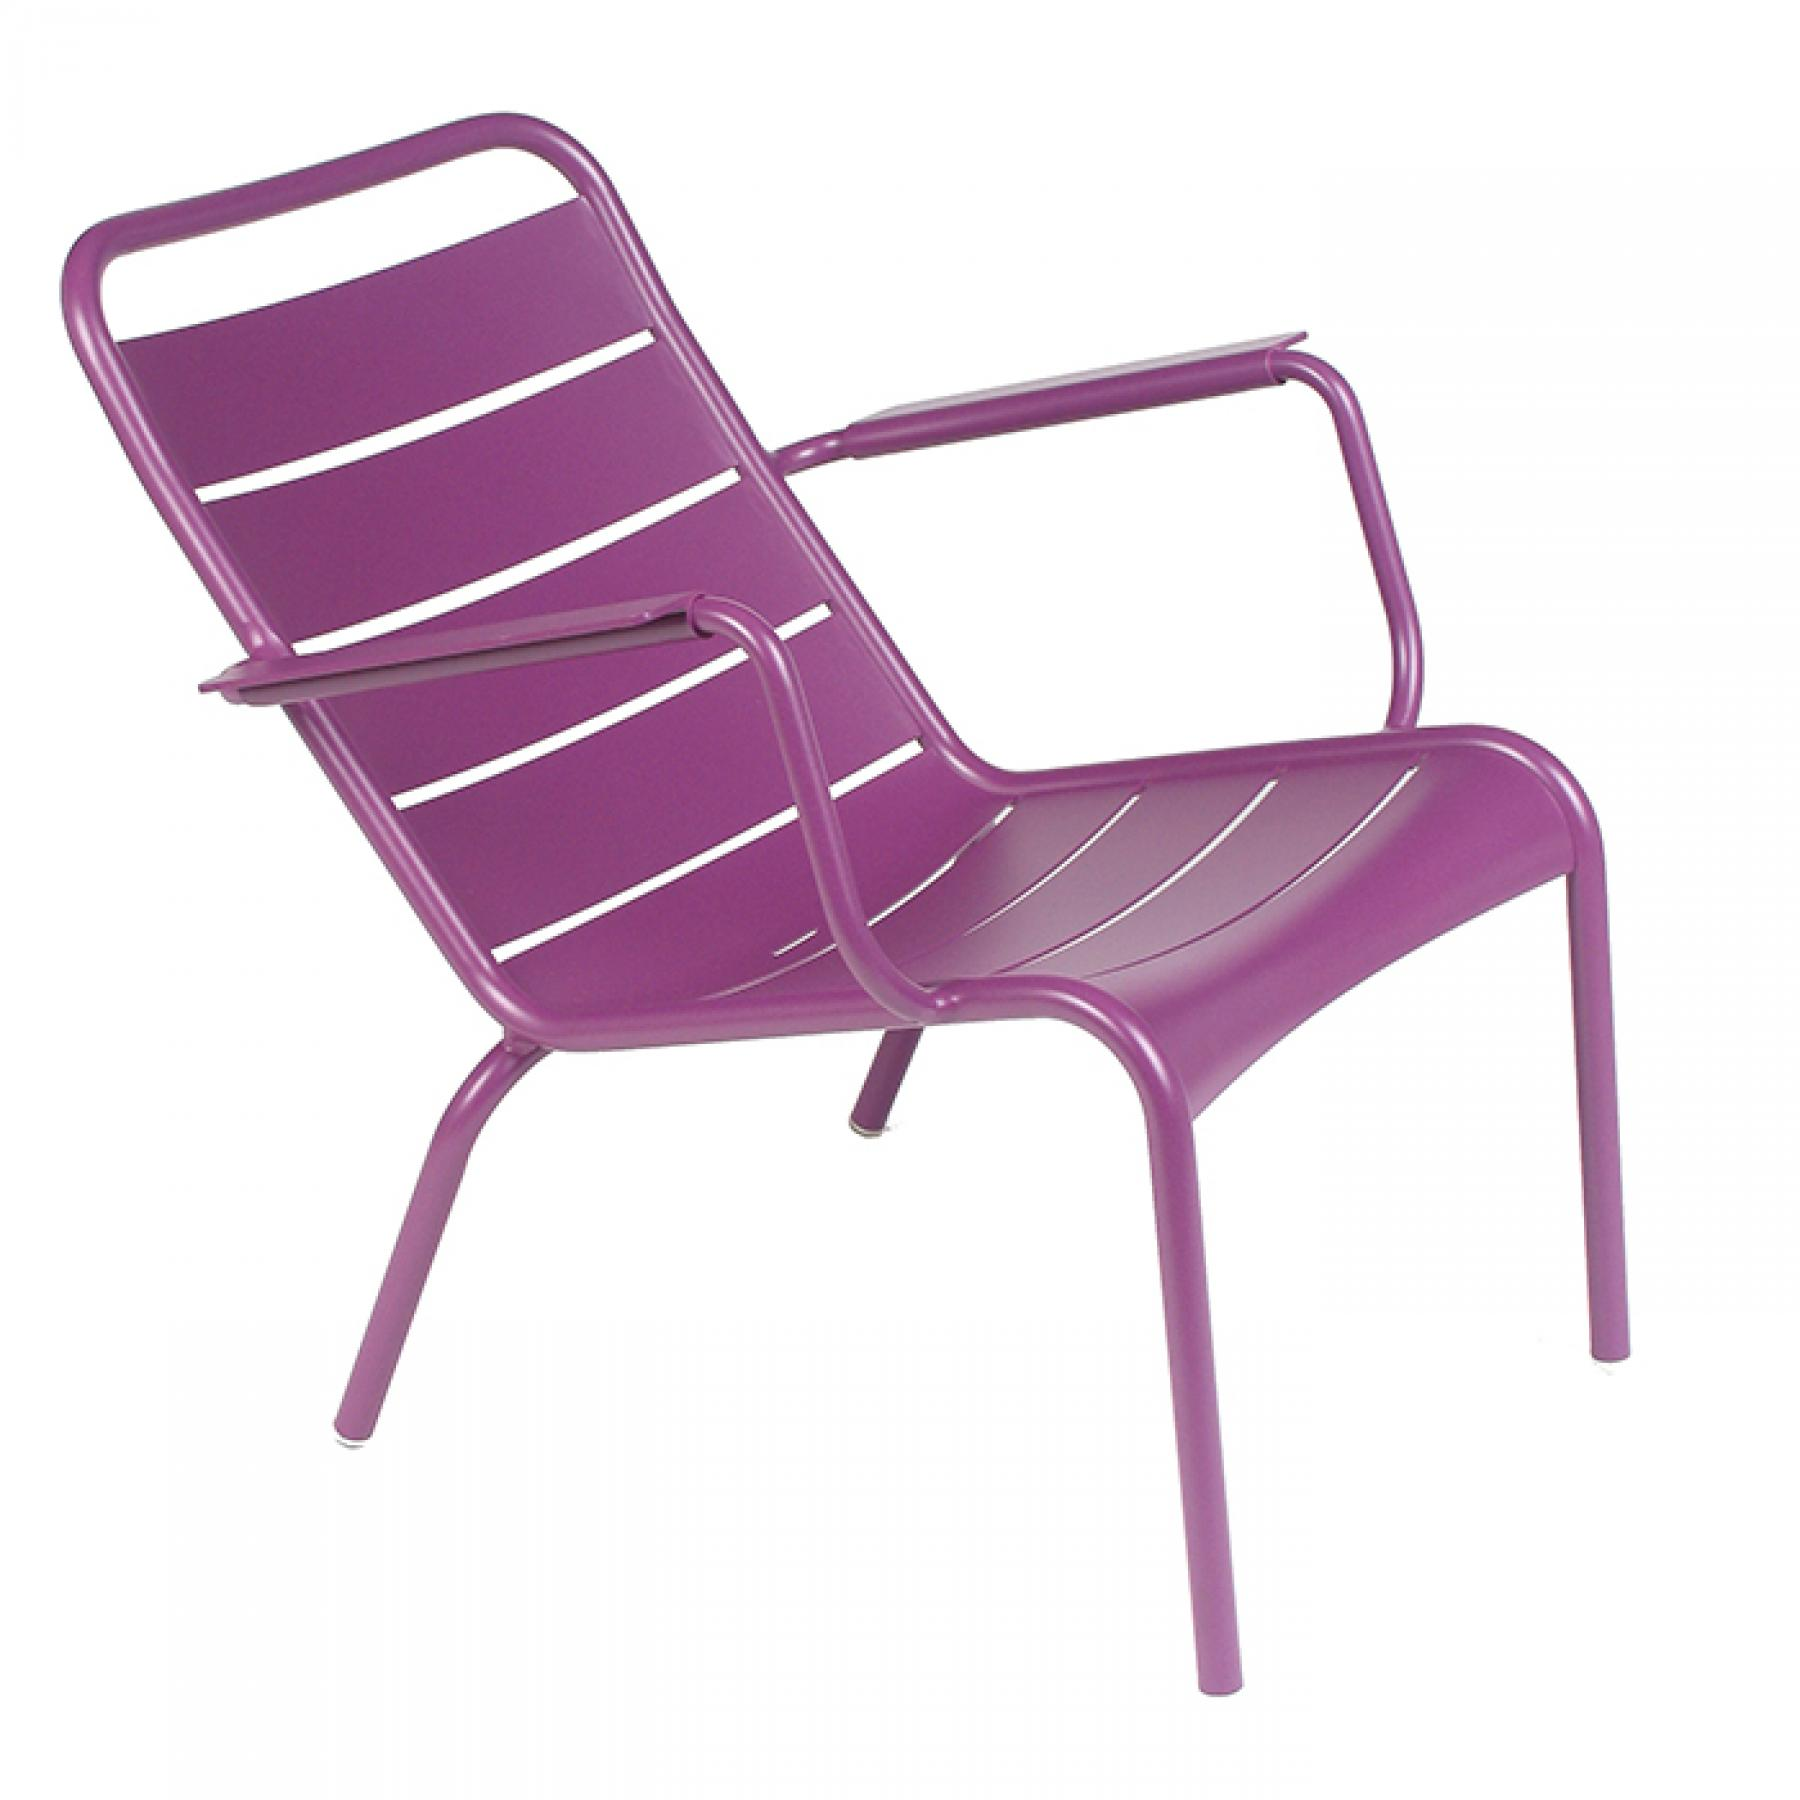 low armchair footrest skepp design item